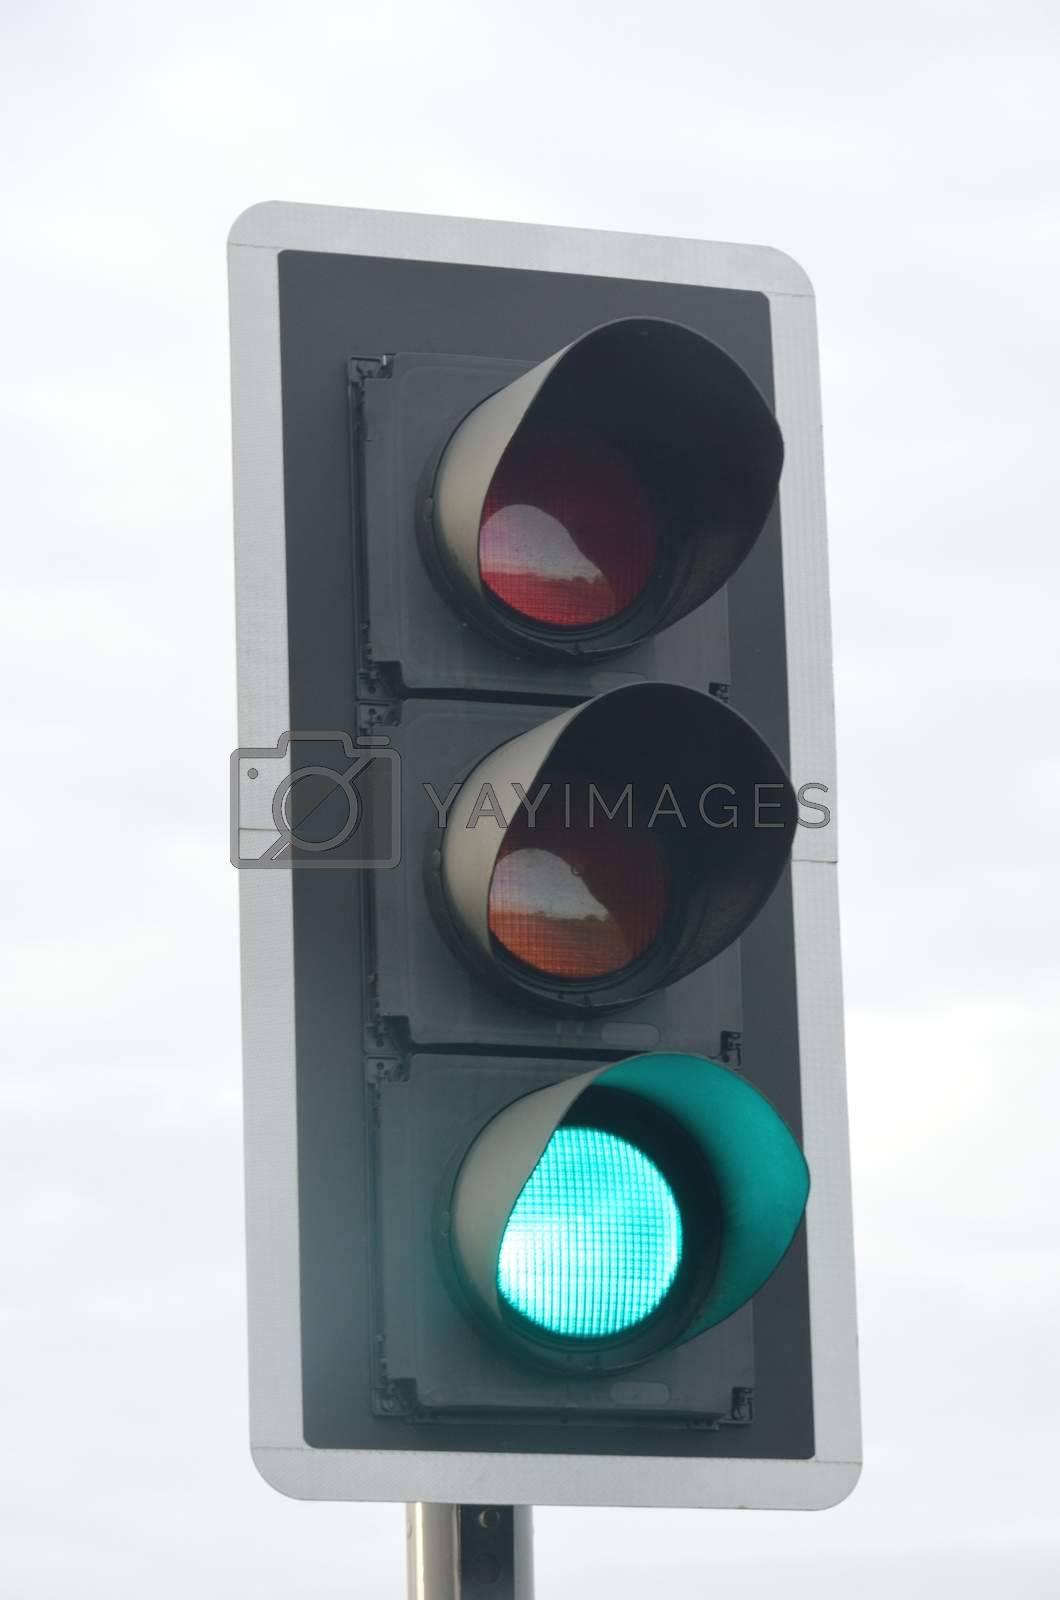 Traffic Light signal  at green